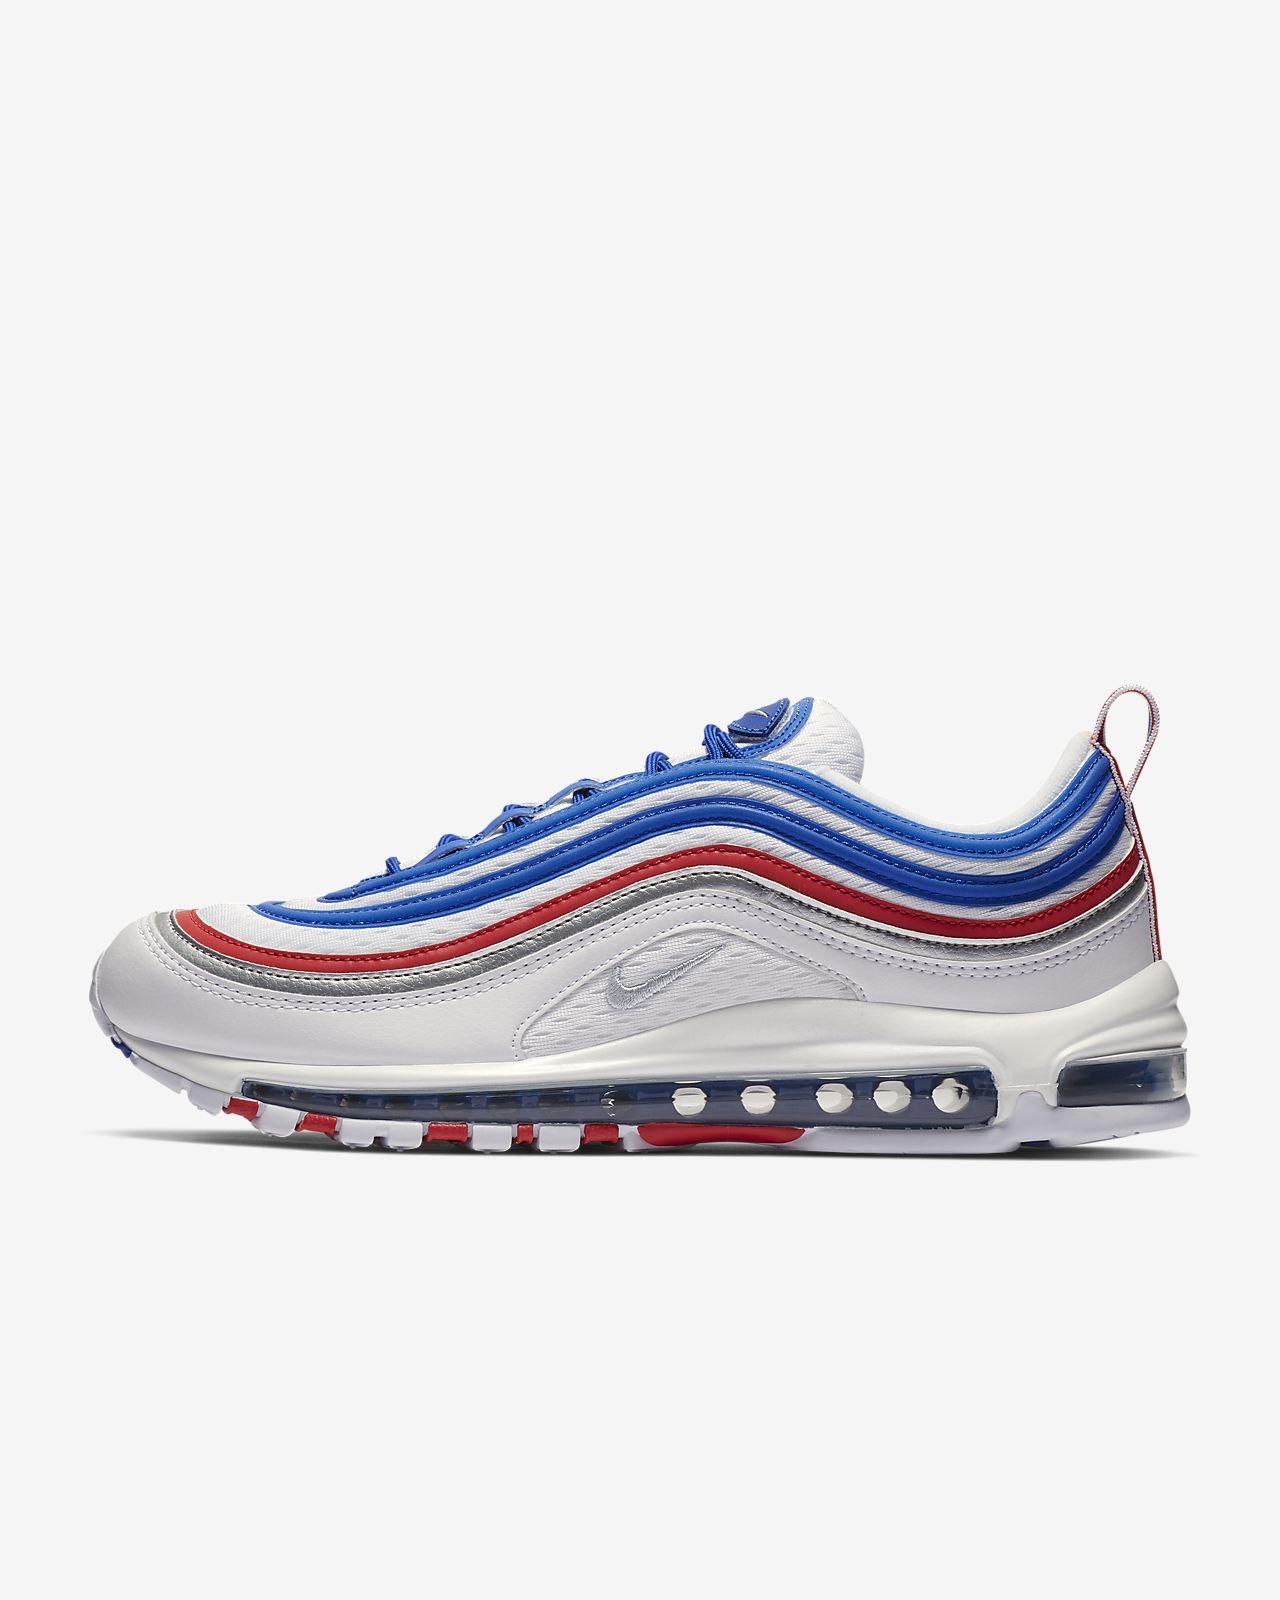 finest selection 8271b 33485 ... Scarpa Nike Air Max 97 - Uomo